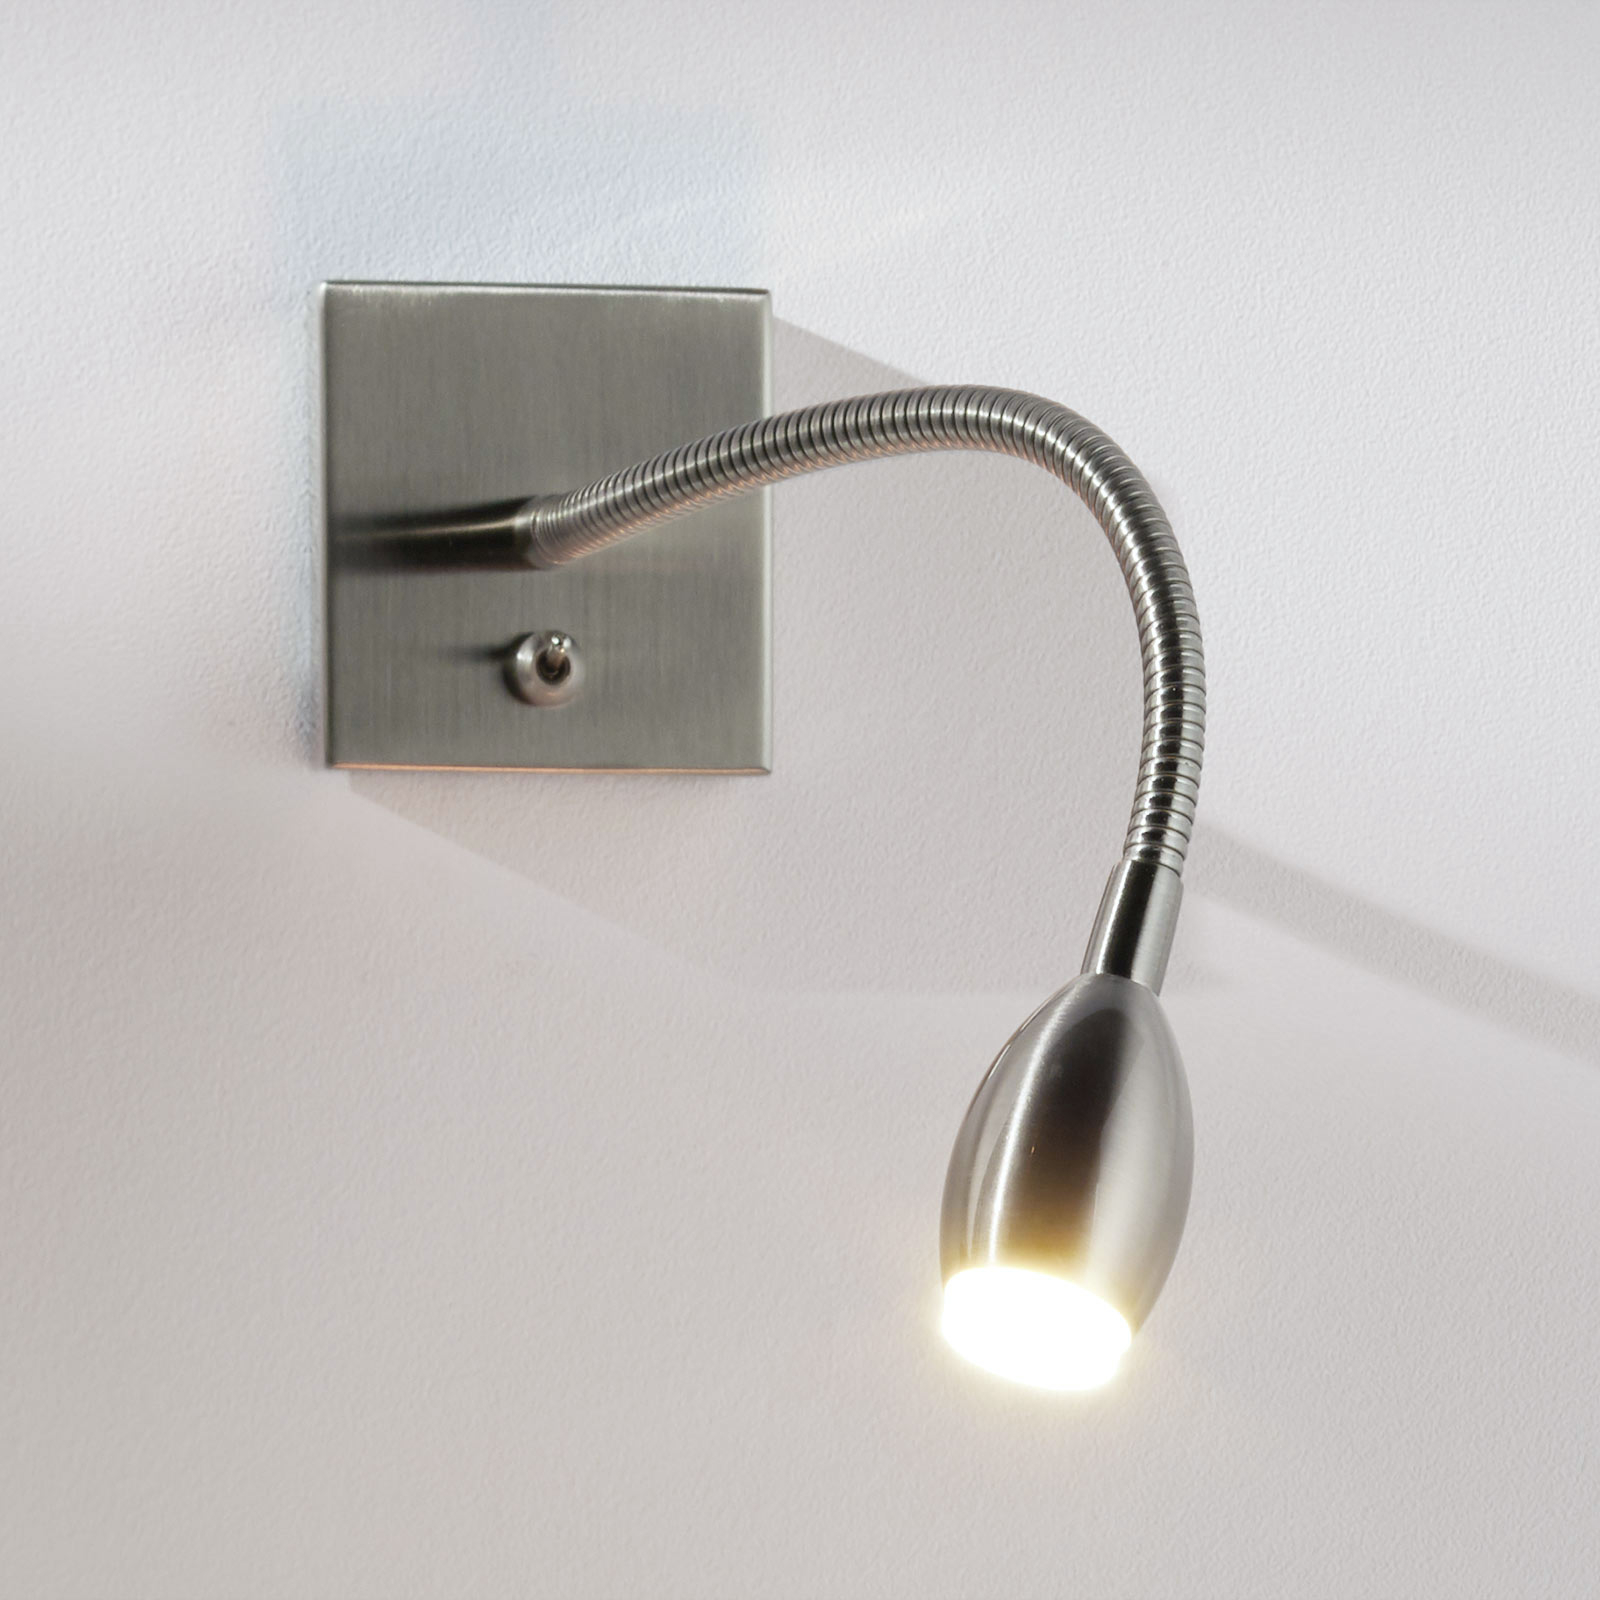 LED wall light PILAR with flex arm, nickel_1050007_1